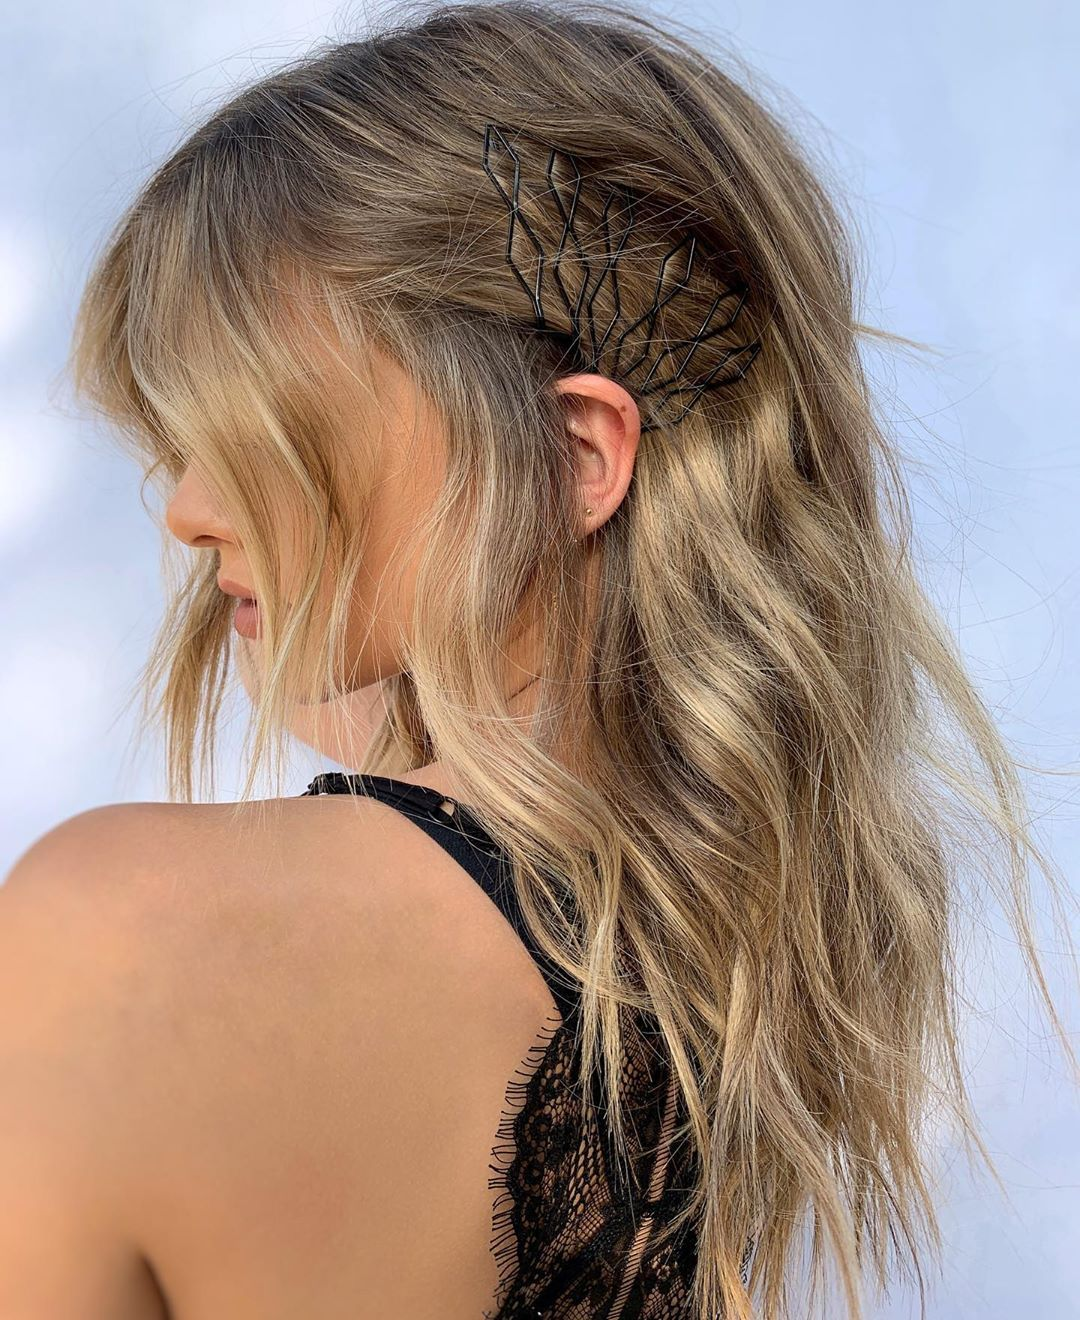 50 Brilliant Haircuts For Fine Hair Worth Trying In 2020 Hair Adviser In 2020 Thin Fine Hair Haircuts For Fine Hair Hair Styles